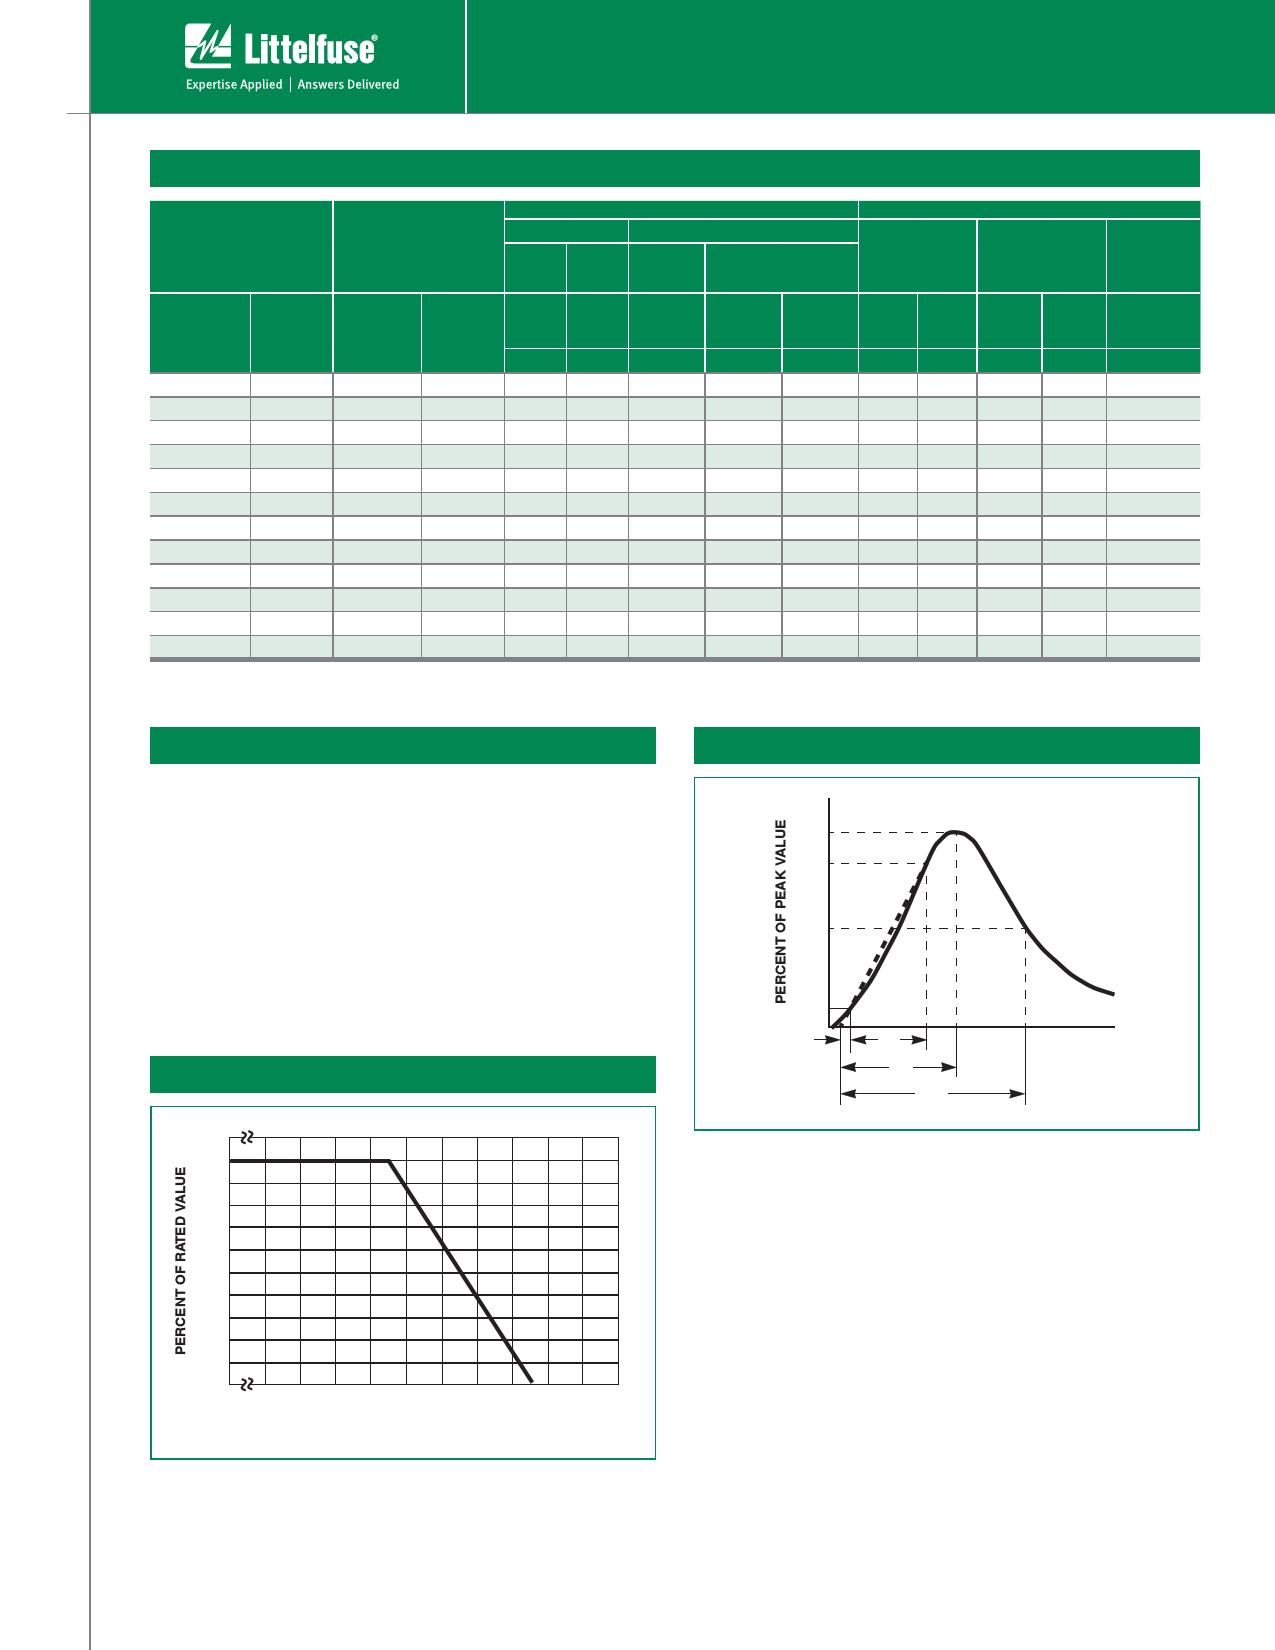 V07E320 pdf, 電子部品, 半導体, ピン配列